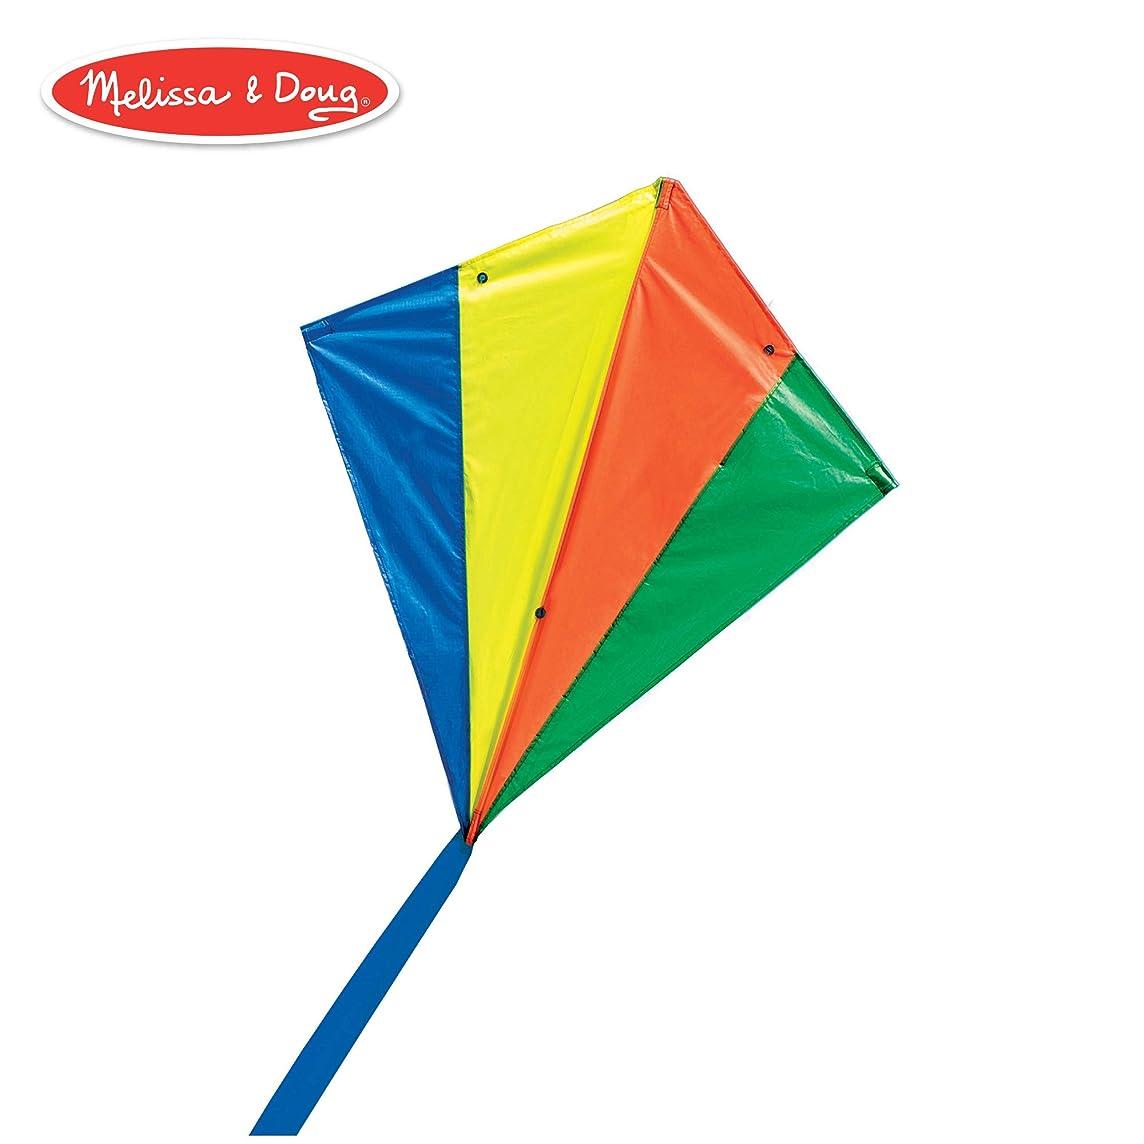 Melissa & Doug Rainbow Stunt Kite Children's Kite